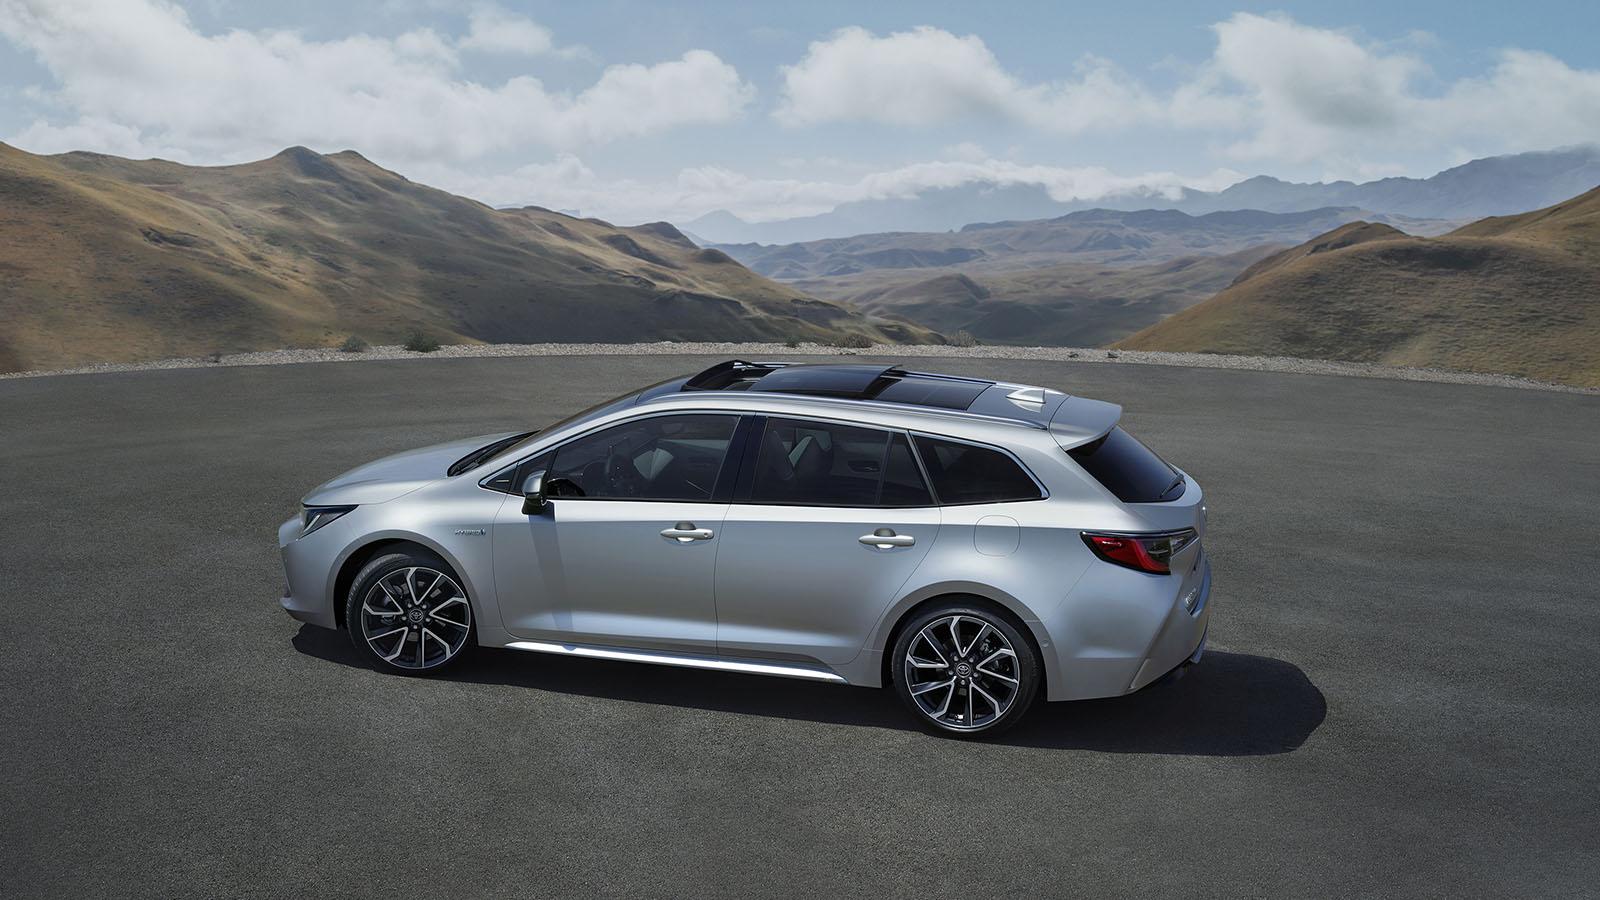 Kelebihan Nova Toyota Corolla Murah Berkualitas